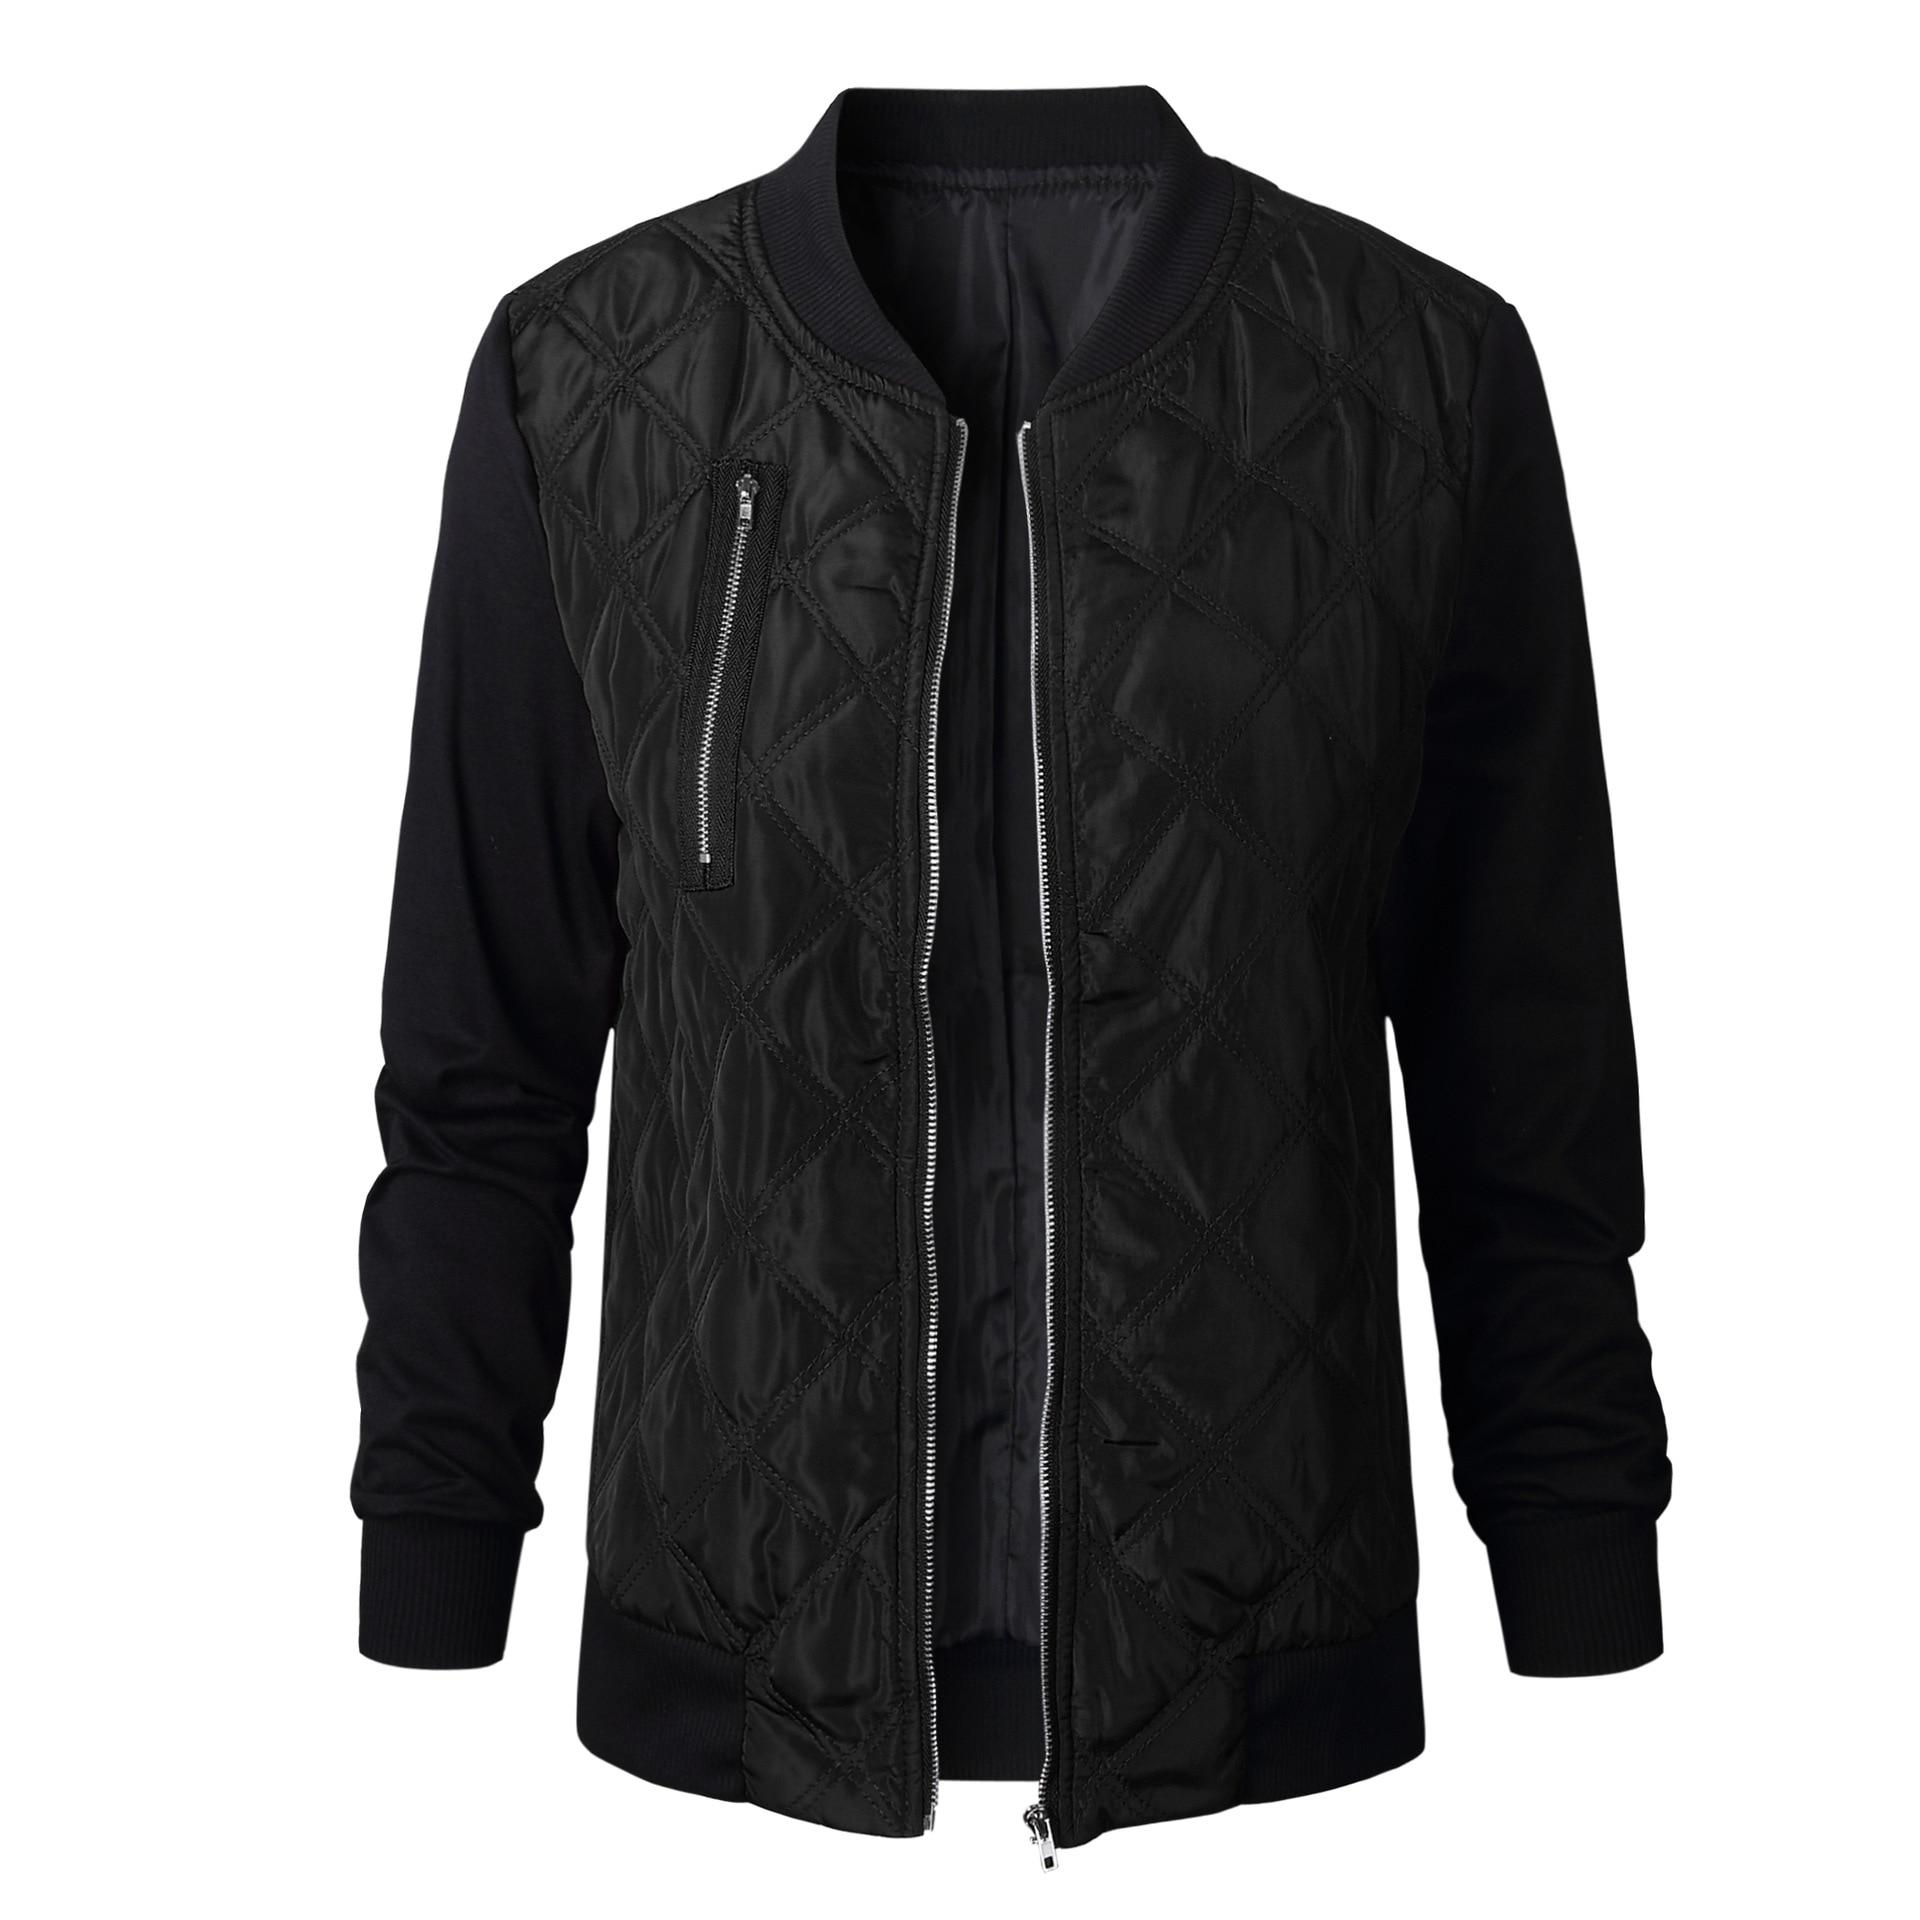 HTB17nXKFv1TBuNjy0Fjq6yjyXXa2 Plus Size Autumn Winter Fashion Slim Women's Jacket Zipper Cardigan Splice Bomber Jackets 2019 Long Sleeve Bodycon Coats Female